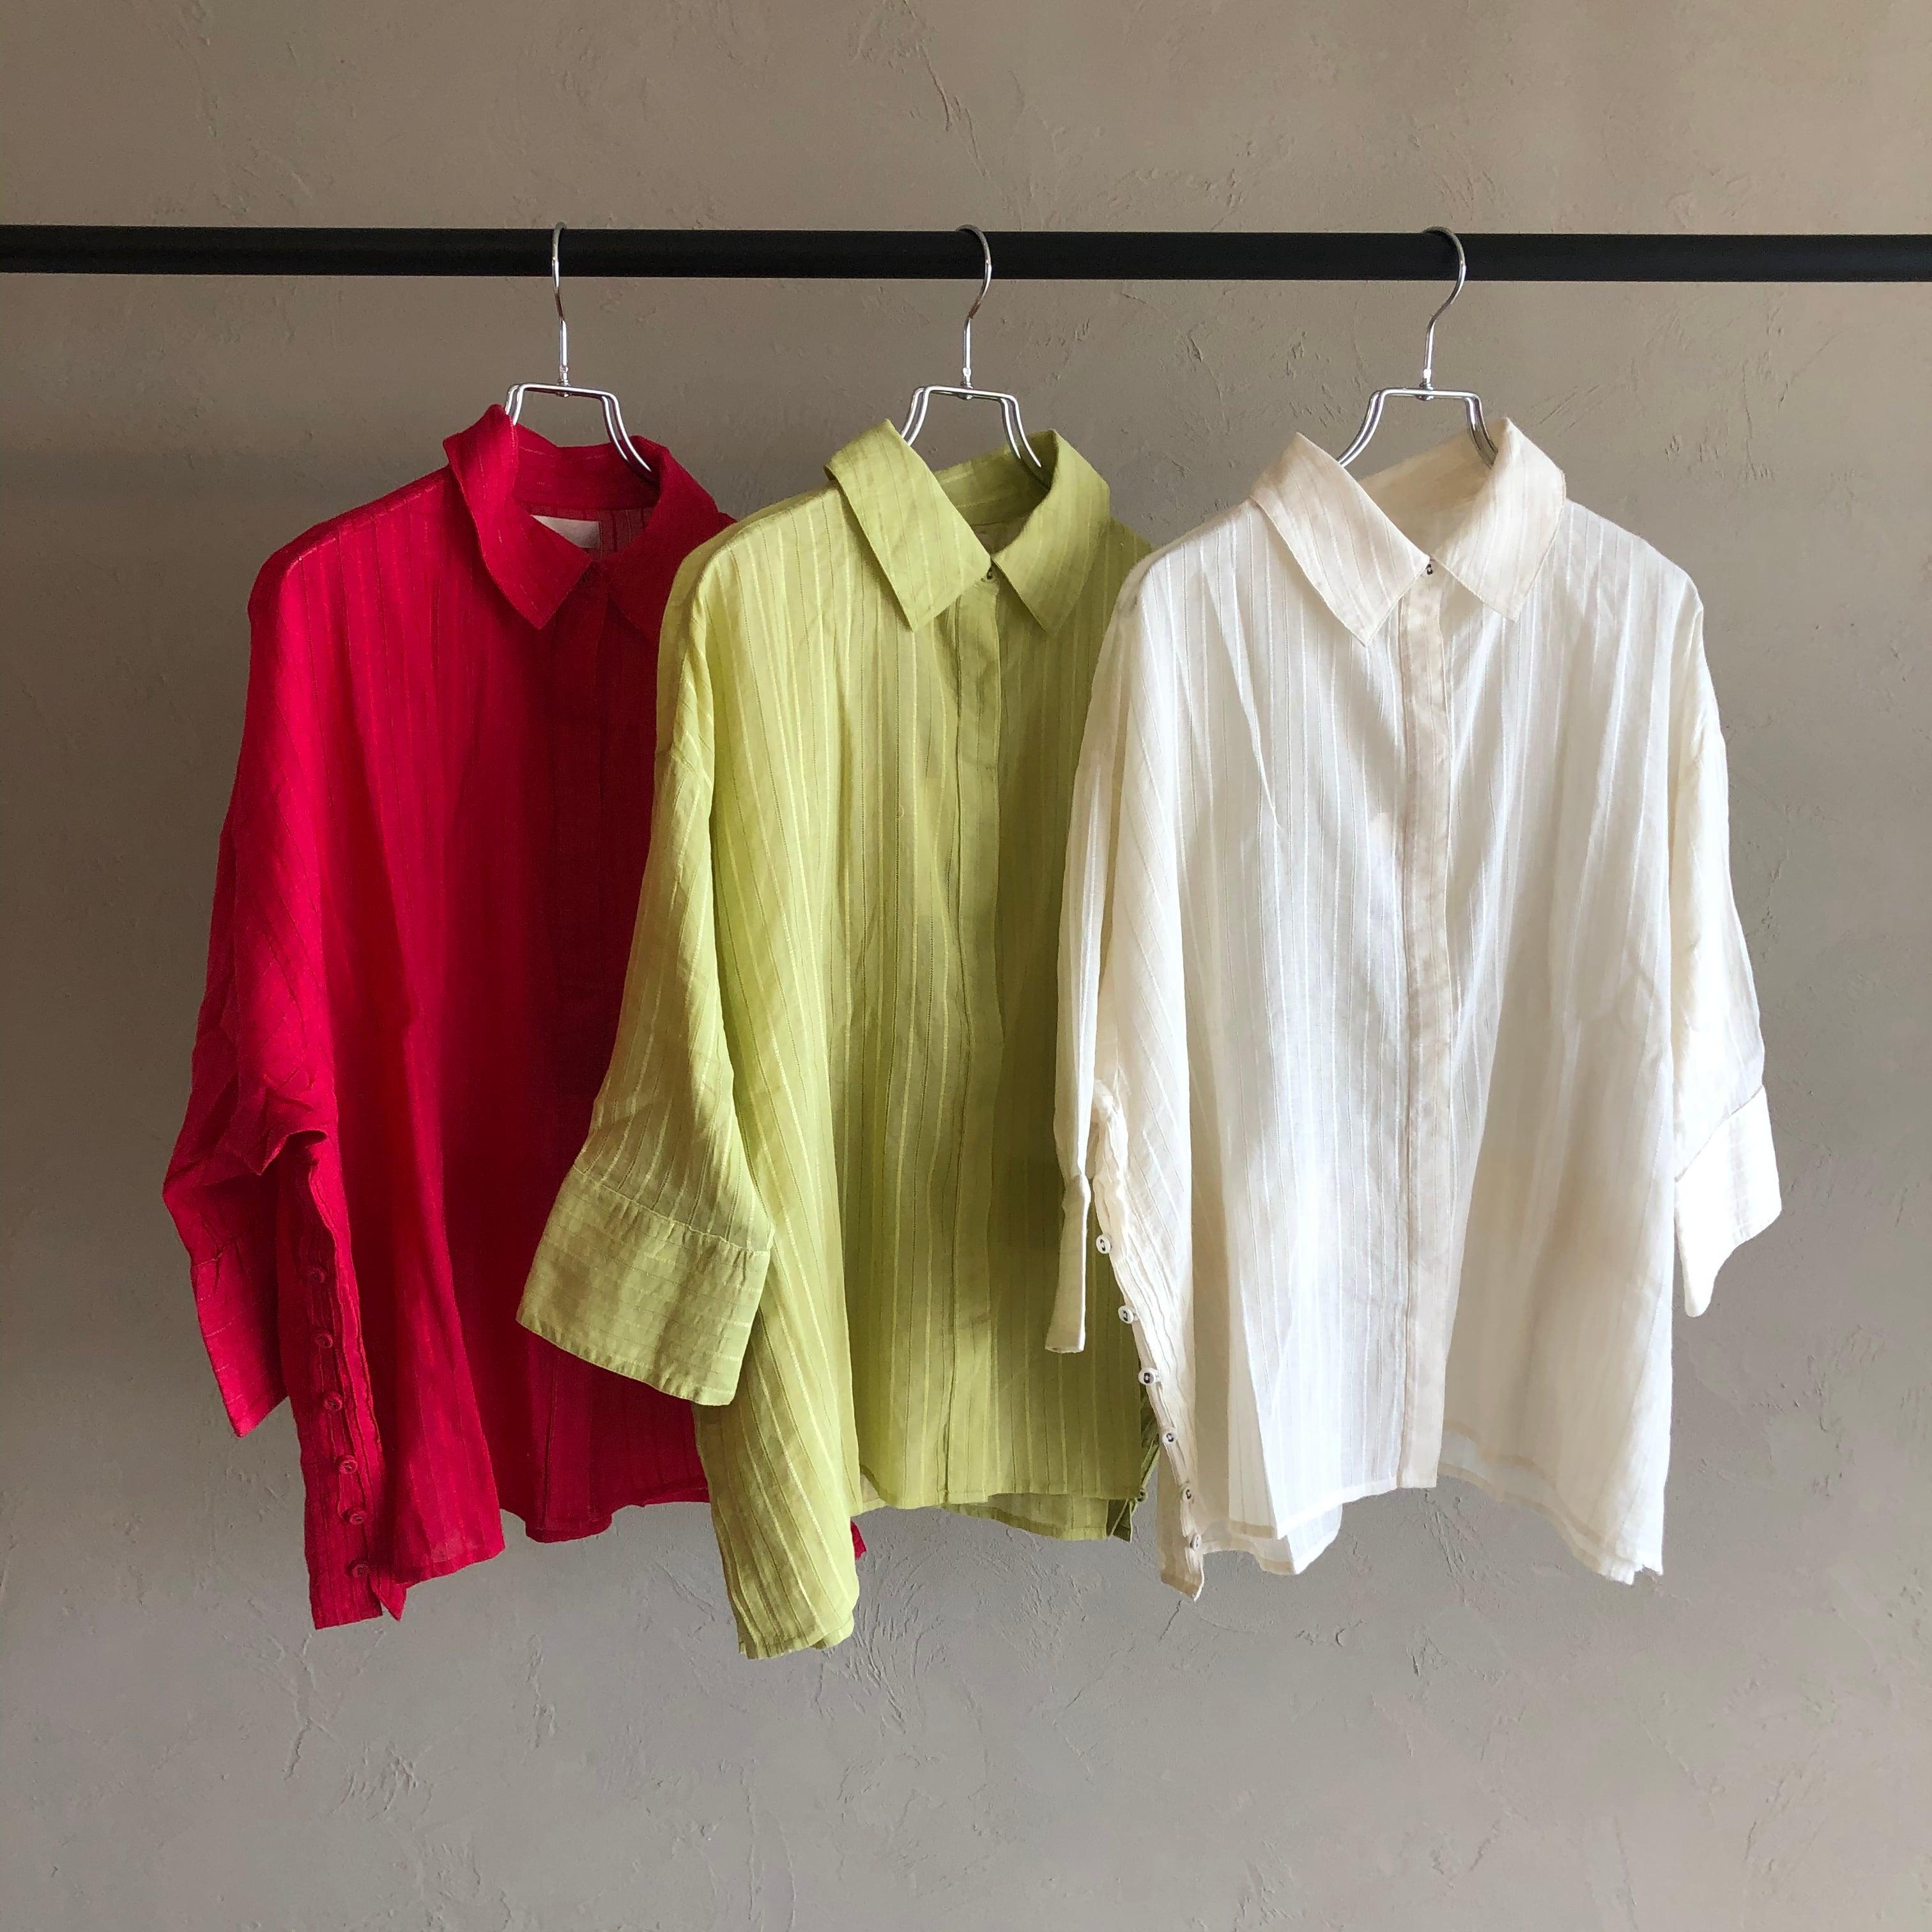 【 valance select 】- 74146-BR - ストライプ刺繍シャツ